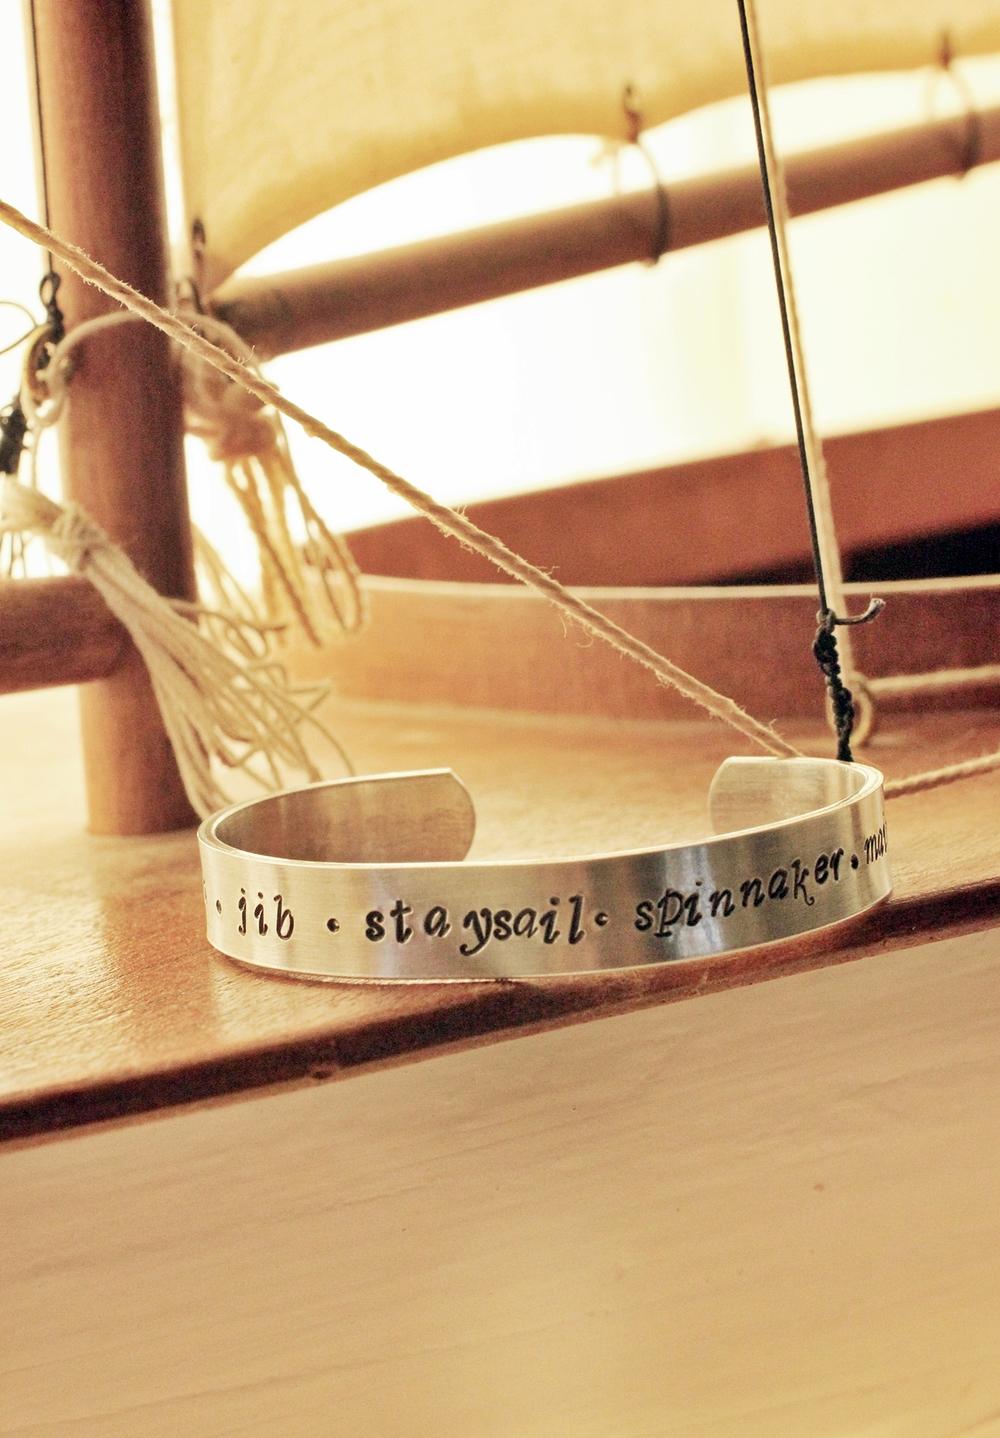 script sails metal cuff hand stamp bracelet by blue sail studios.JPG